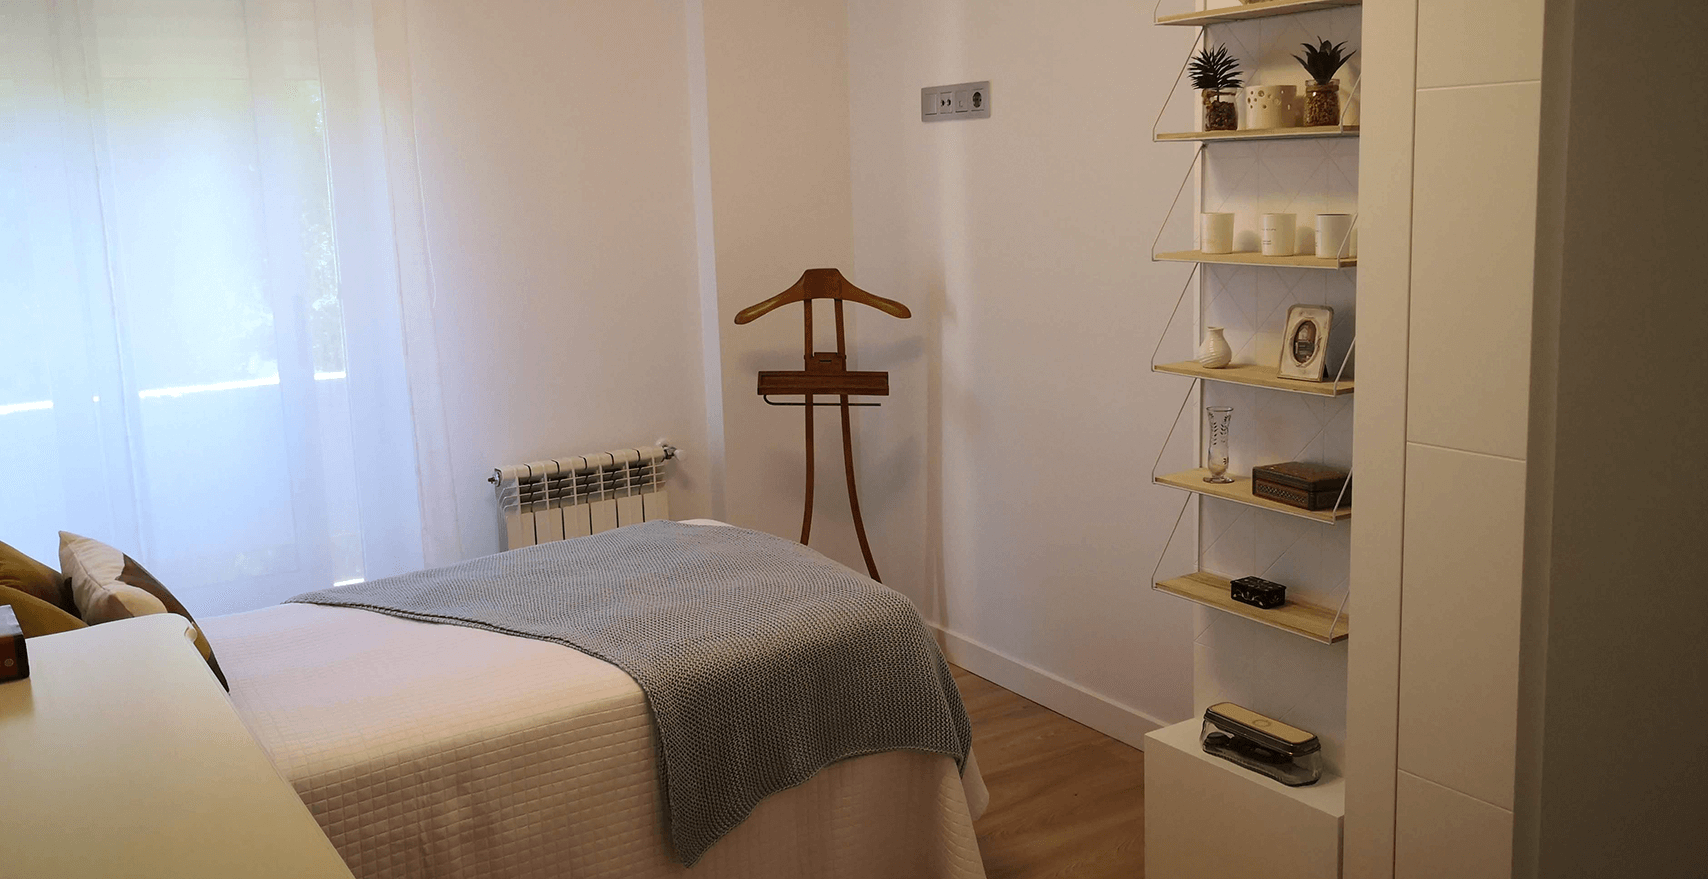 Mumarq Interiorismo y Arquitectura - Diseño de zapatero